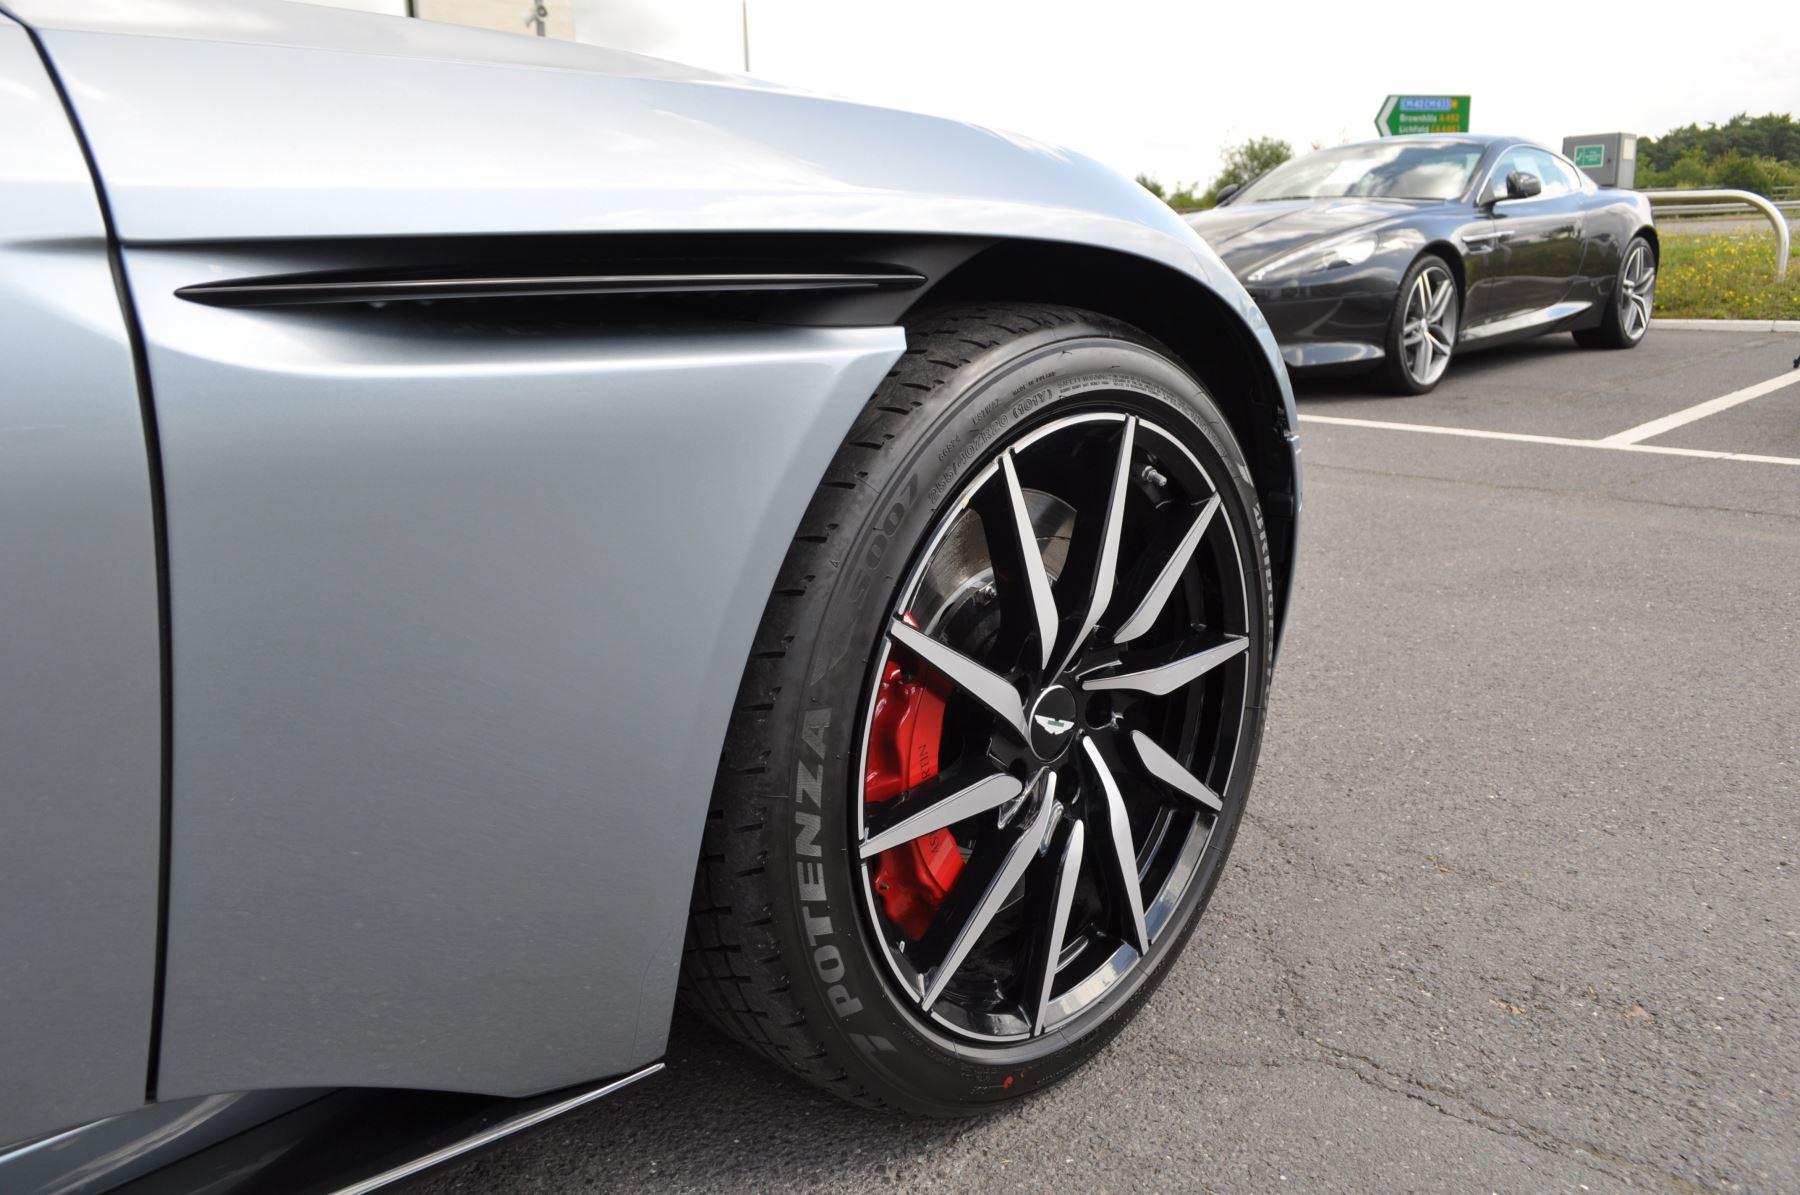 Aston Martin DB11 V8 Touchtronic image 19